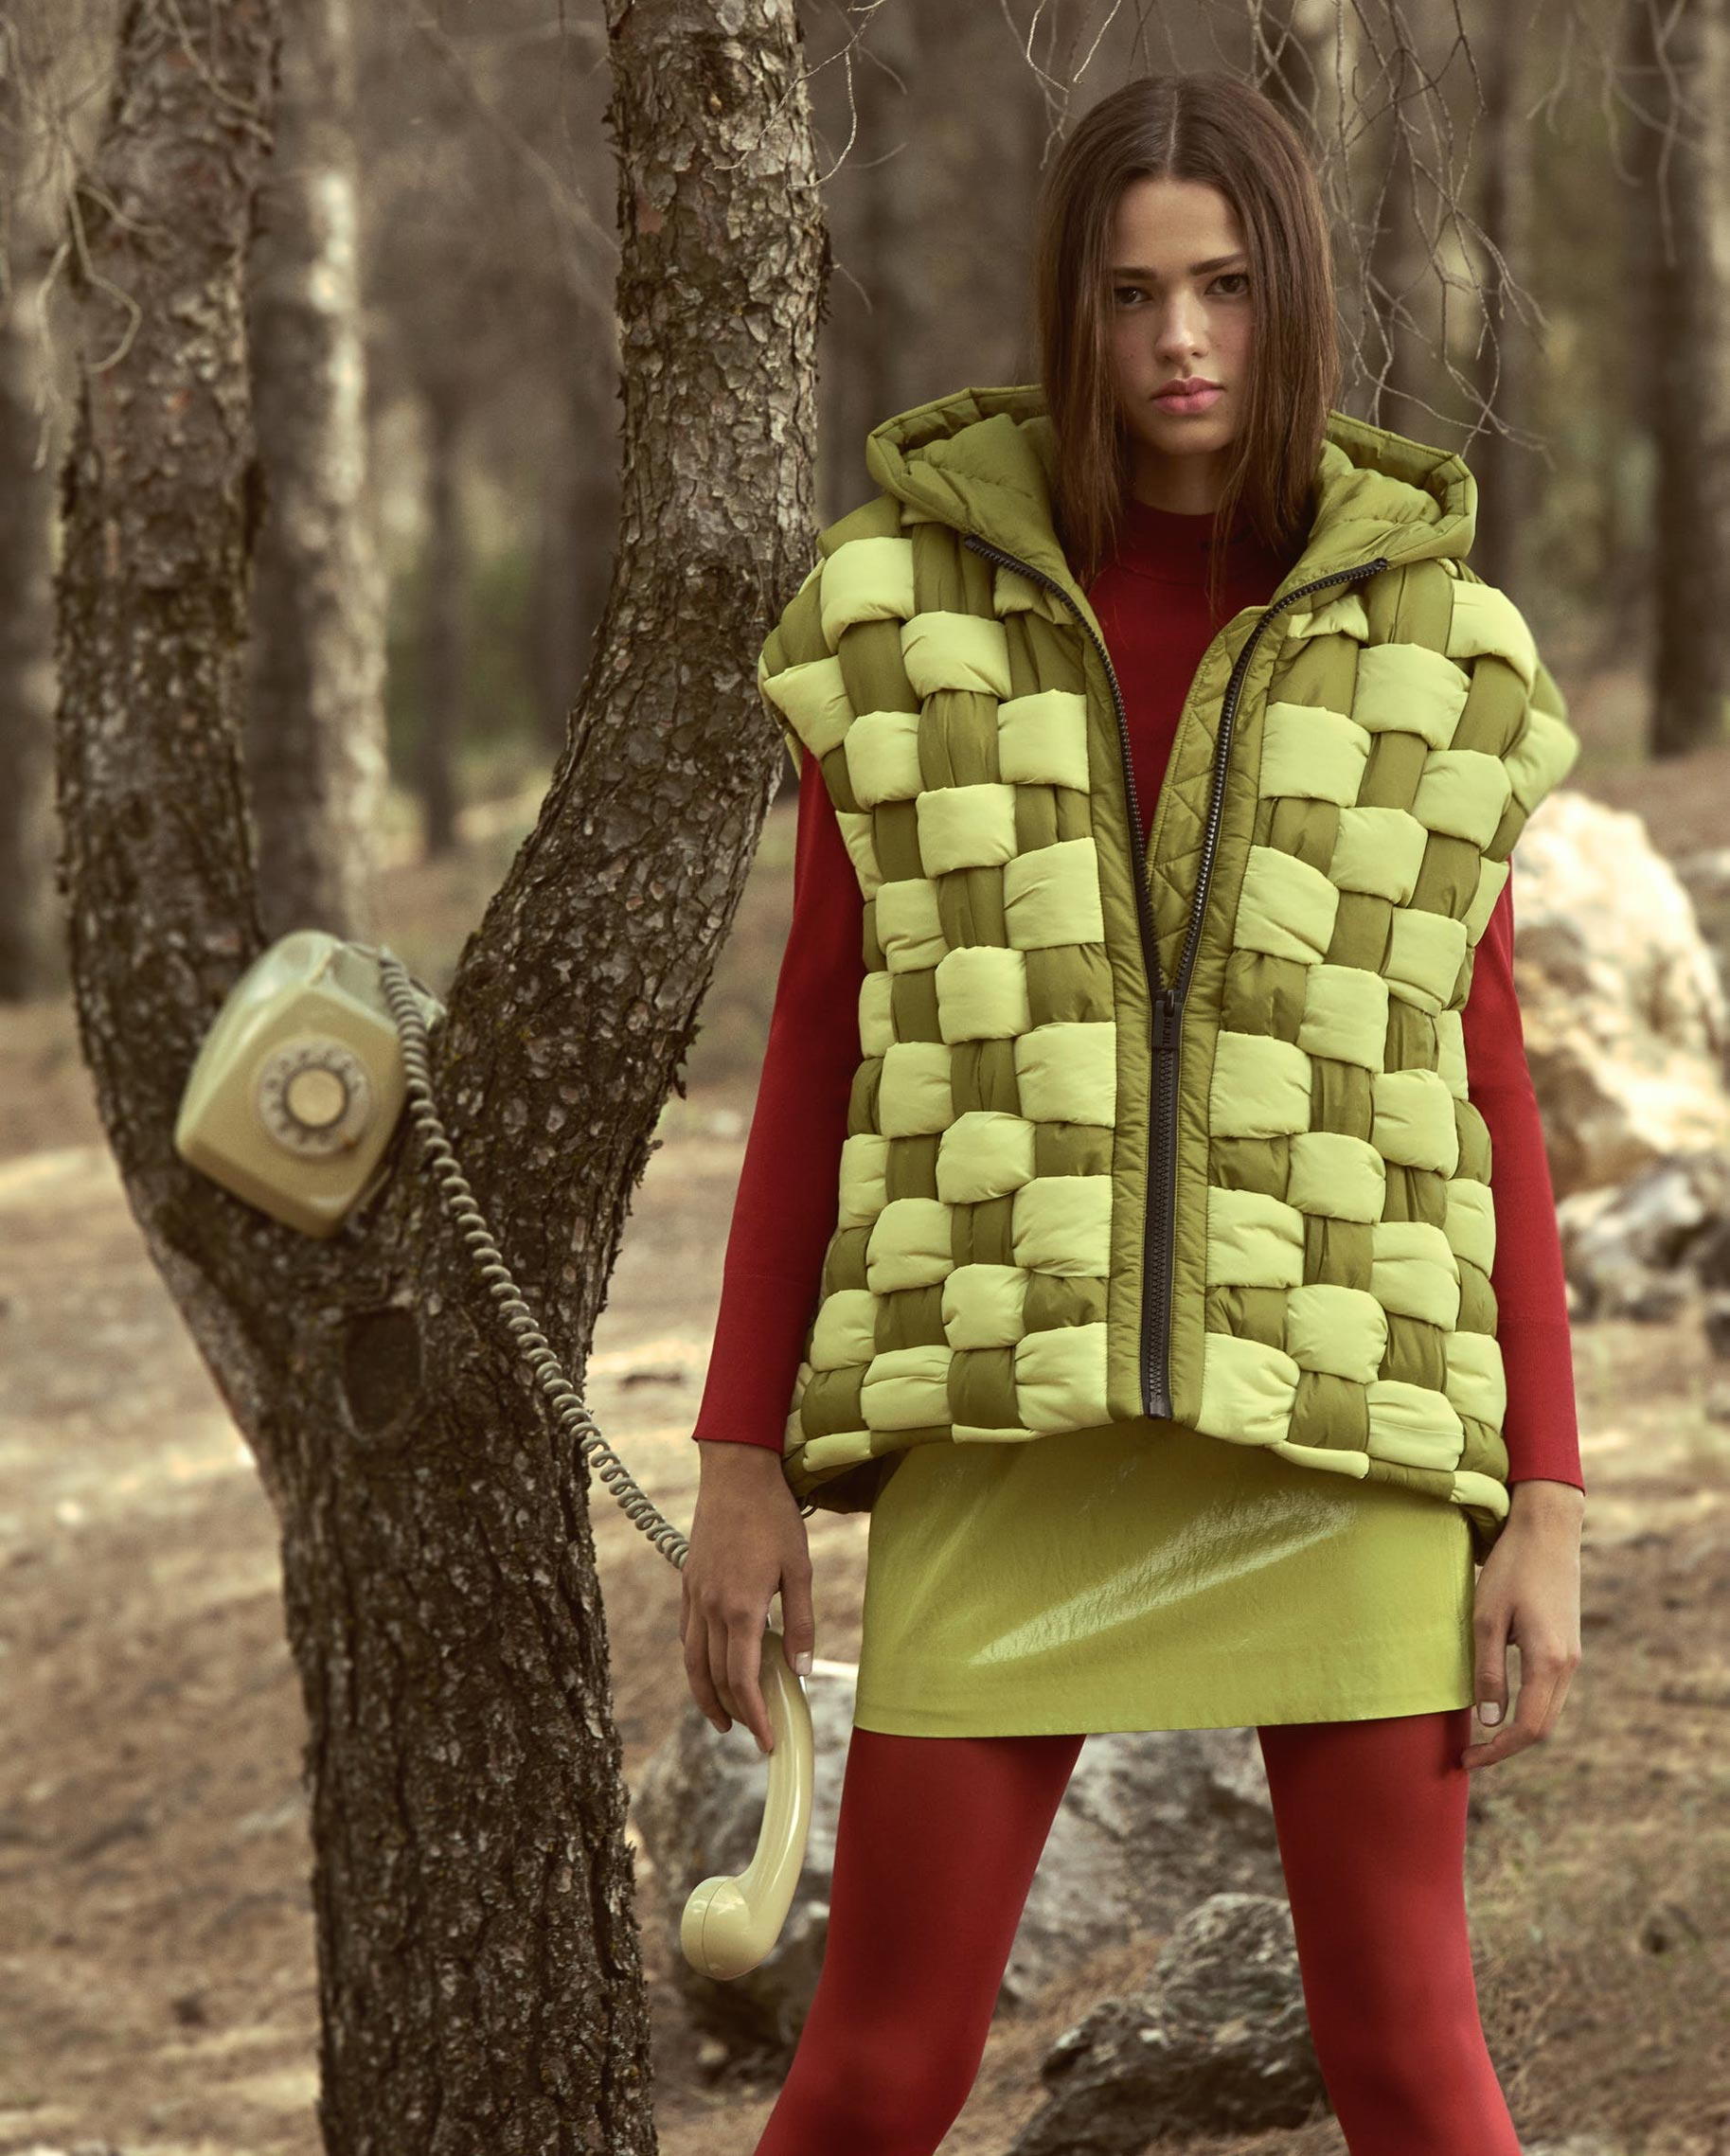 Диана Свиридова в лесу демонстрирует винтажную технику и новинки моды / фото 08